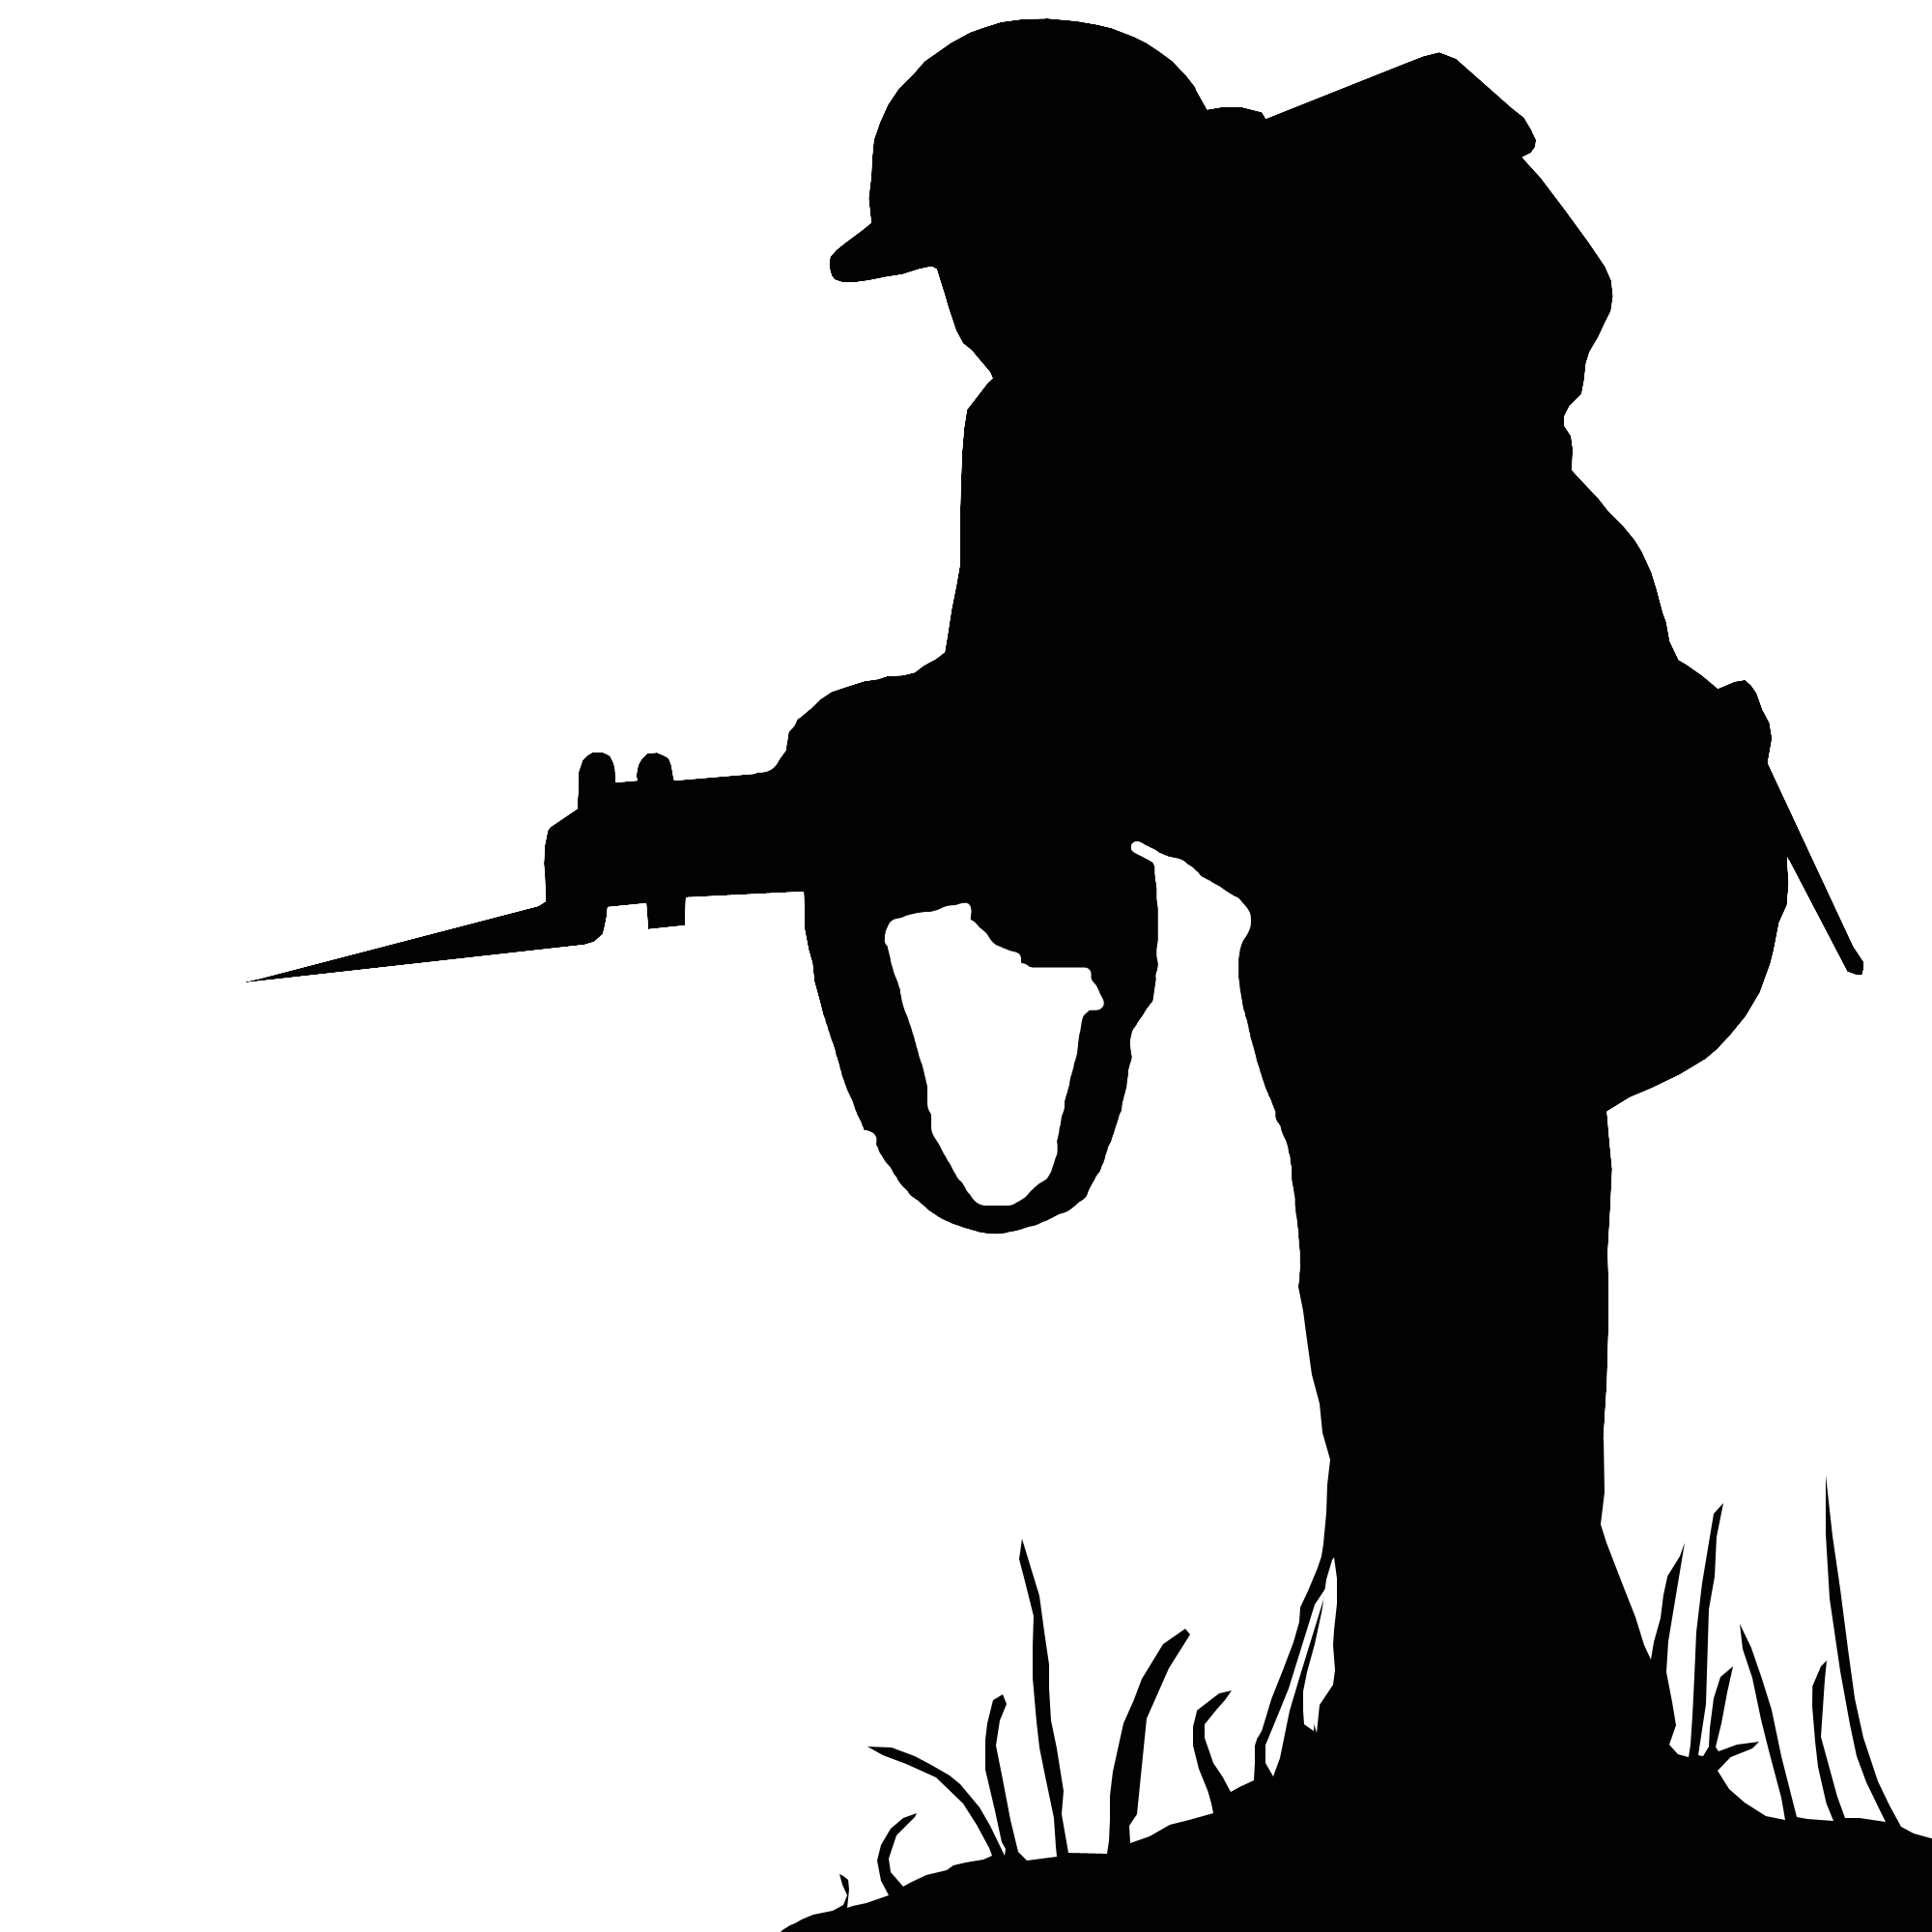 Silhouette Soldier Public domain - sillhouette png ... - Female Soldier Silhouette